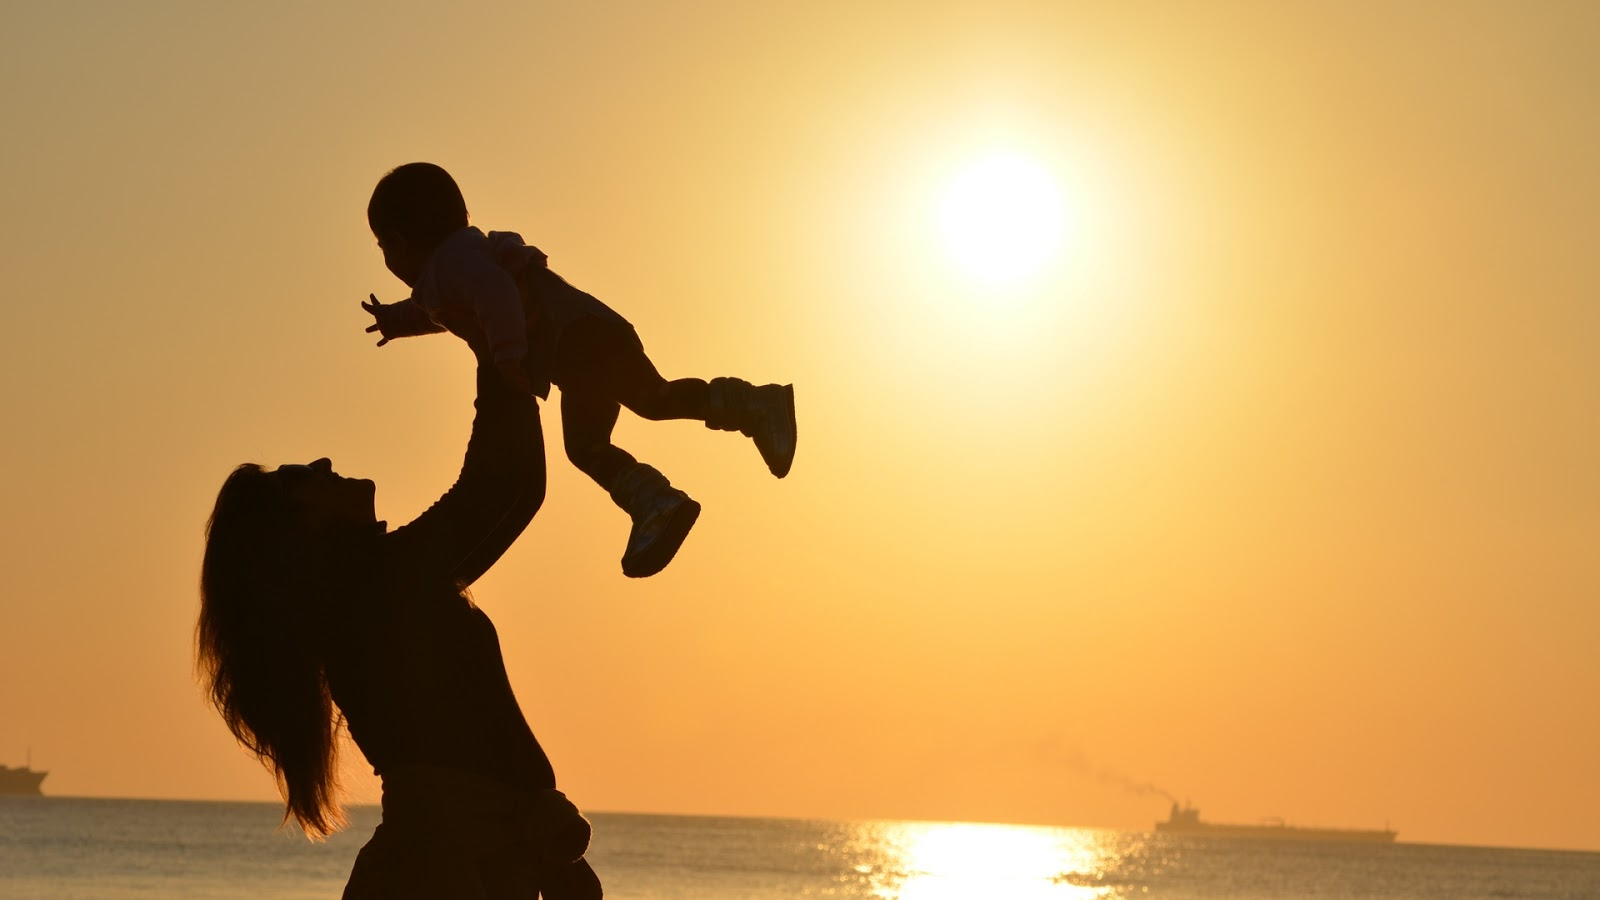 Kumpulan Kata Kata Bijak Untuk Ibu Quote Dan Doa Untuk